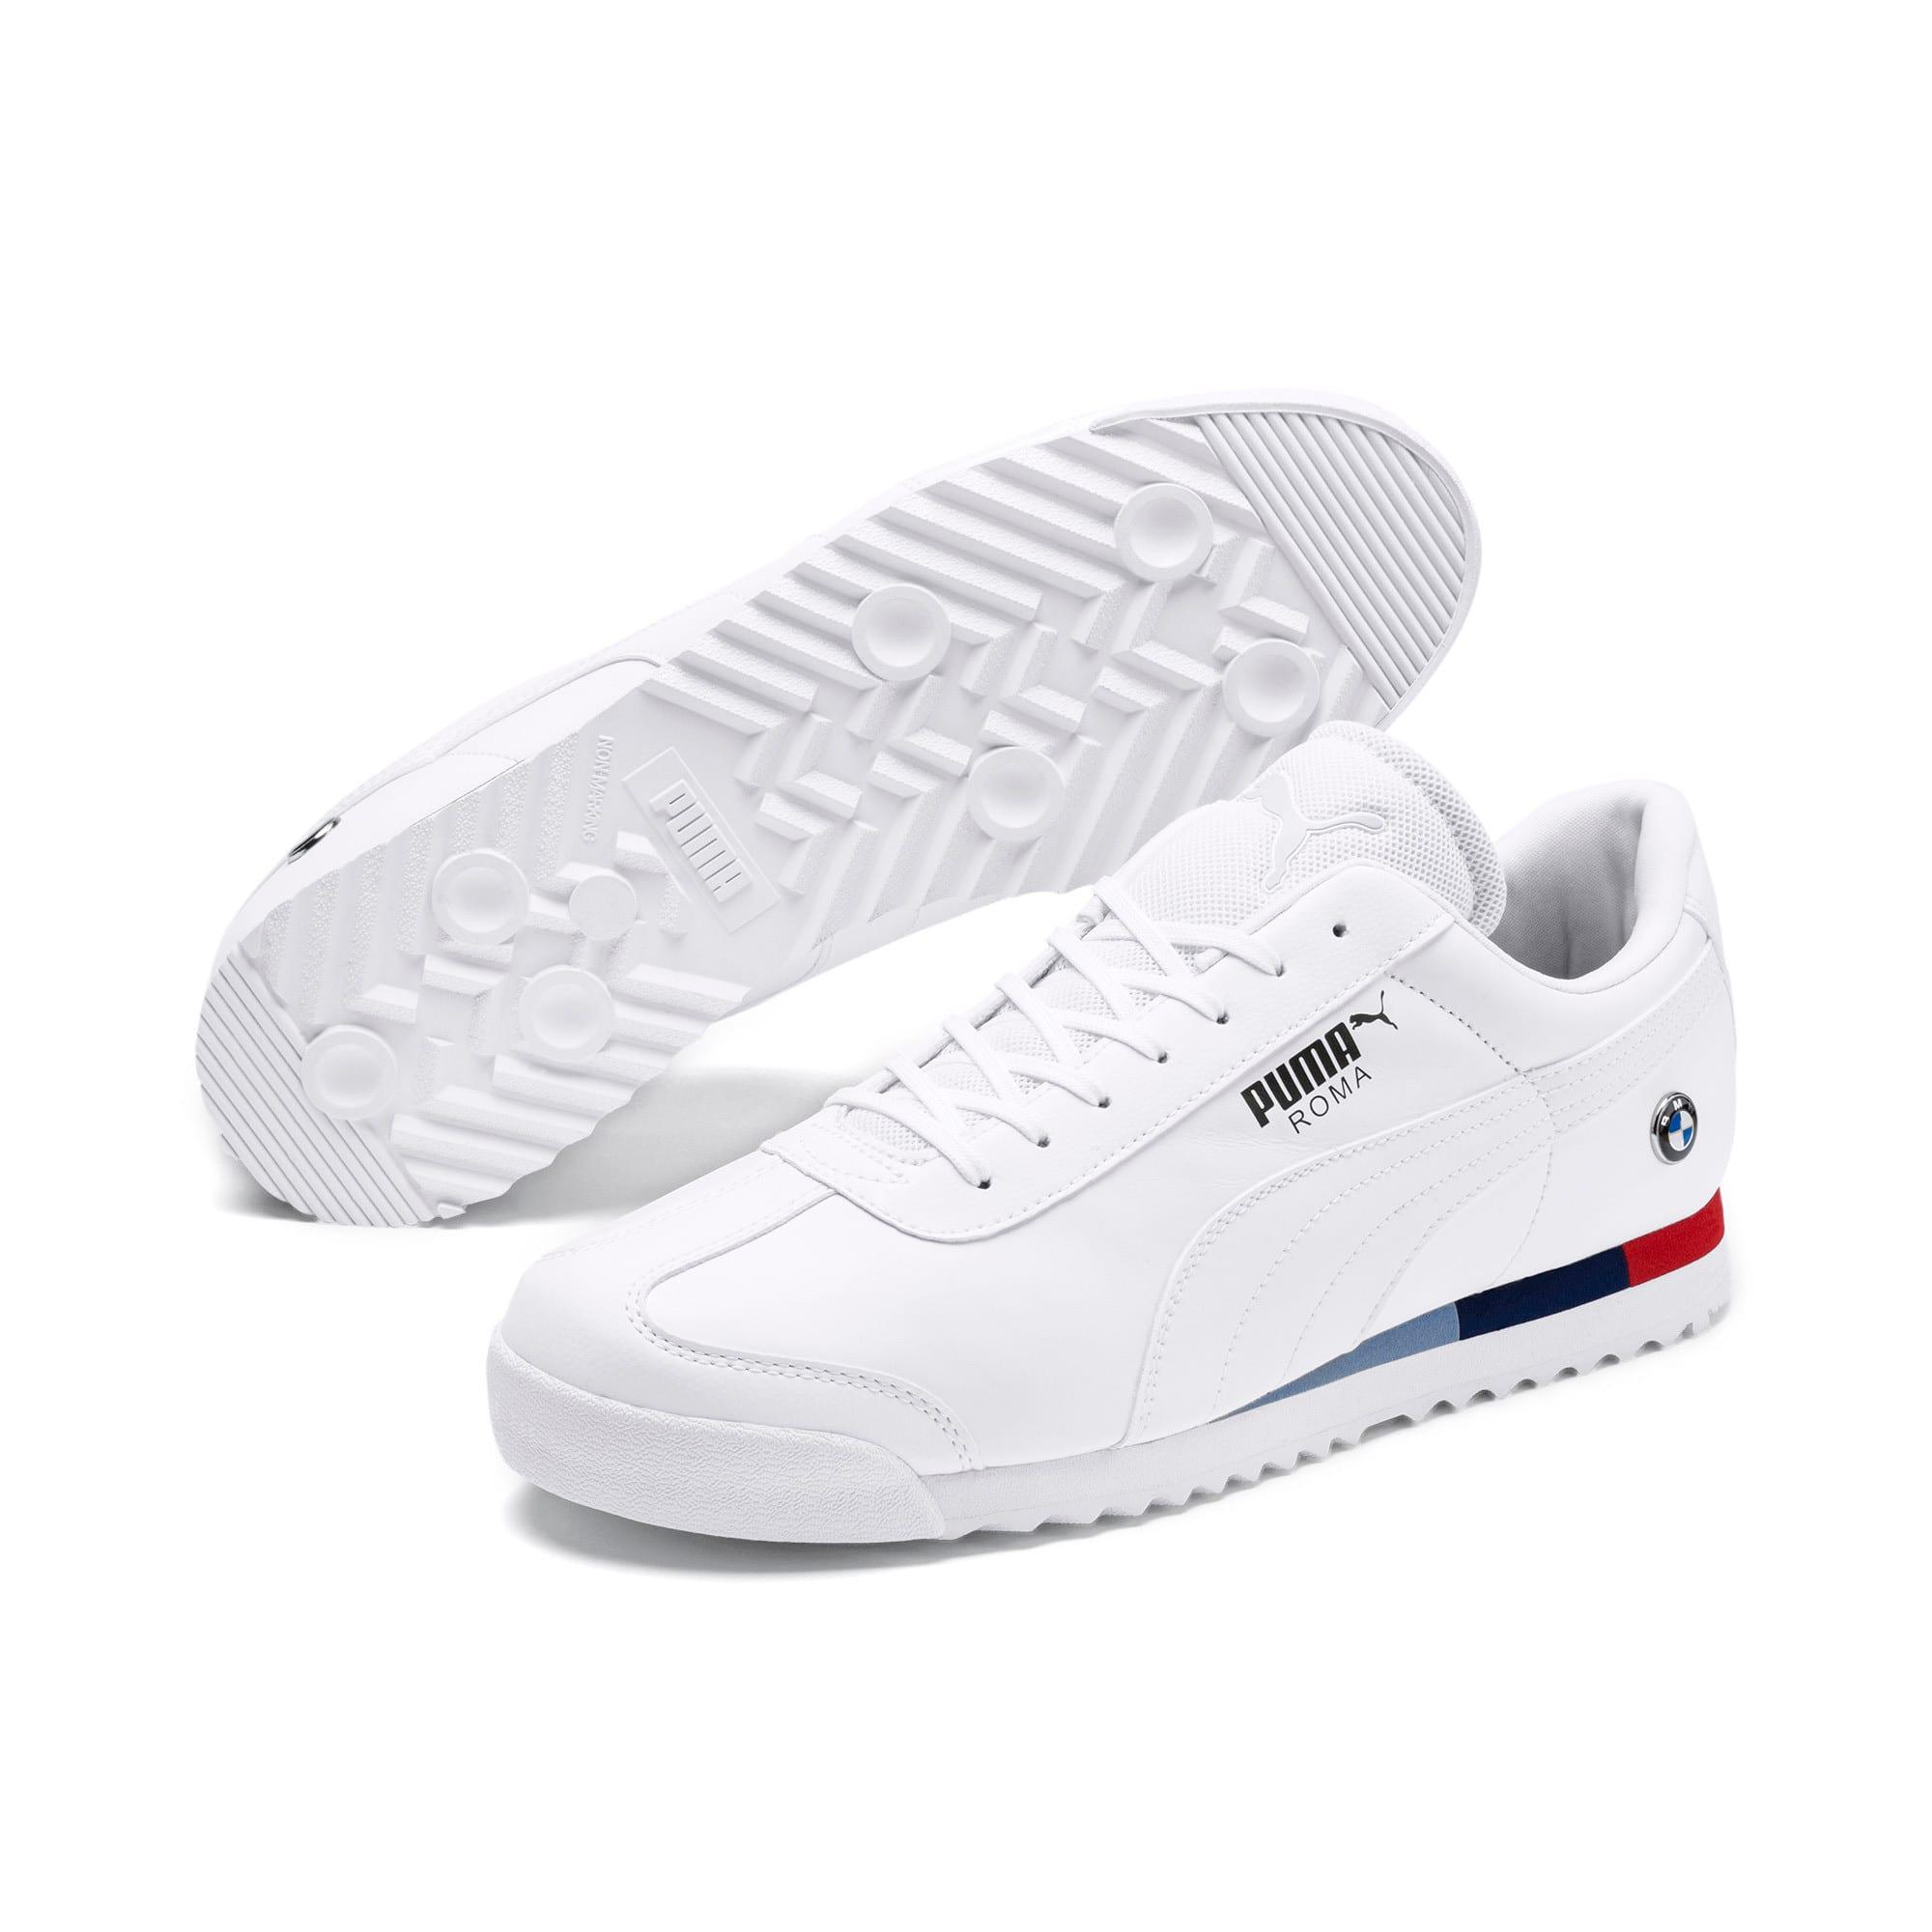 Thumbnail 2 of BMW M Motorsport Roma Men's Sneakers, Puma White-Puma White, medium